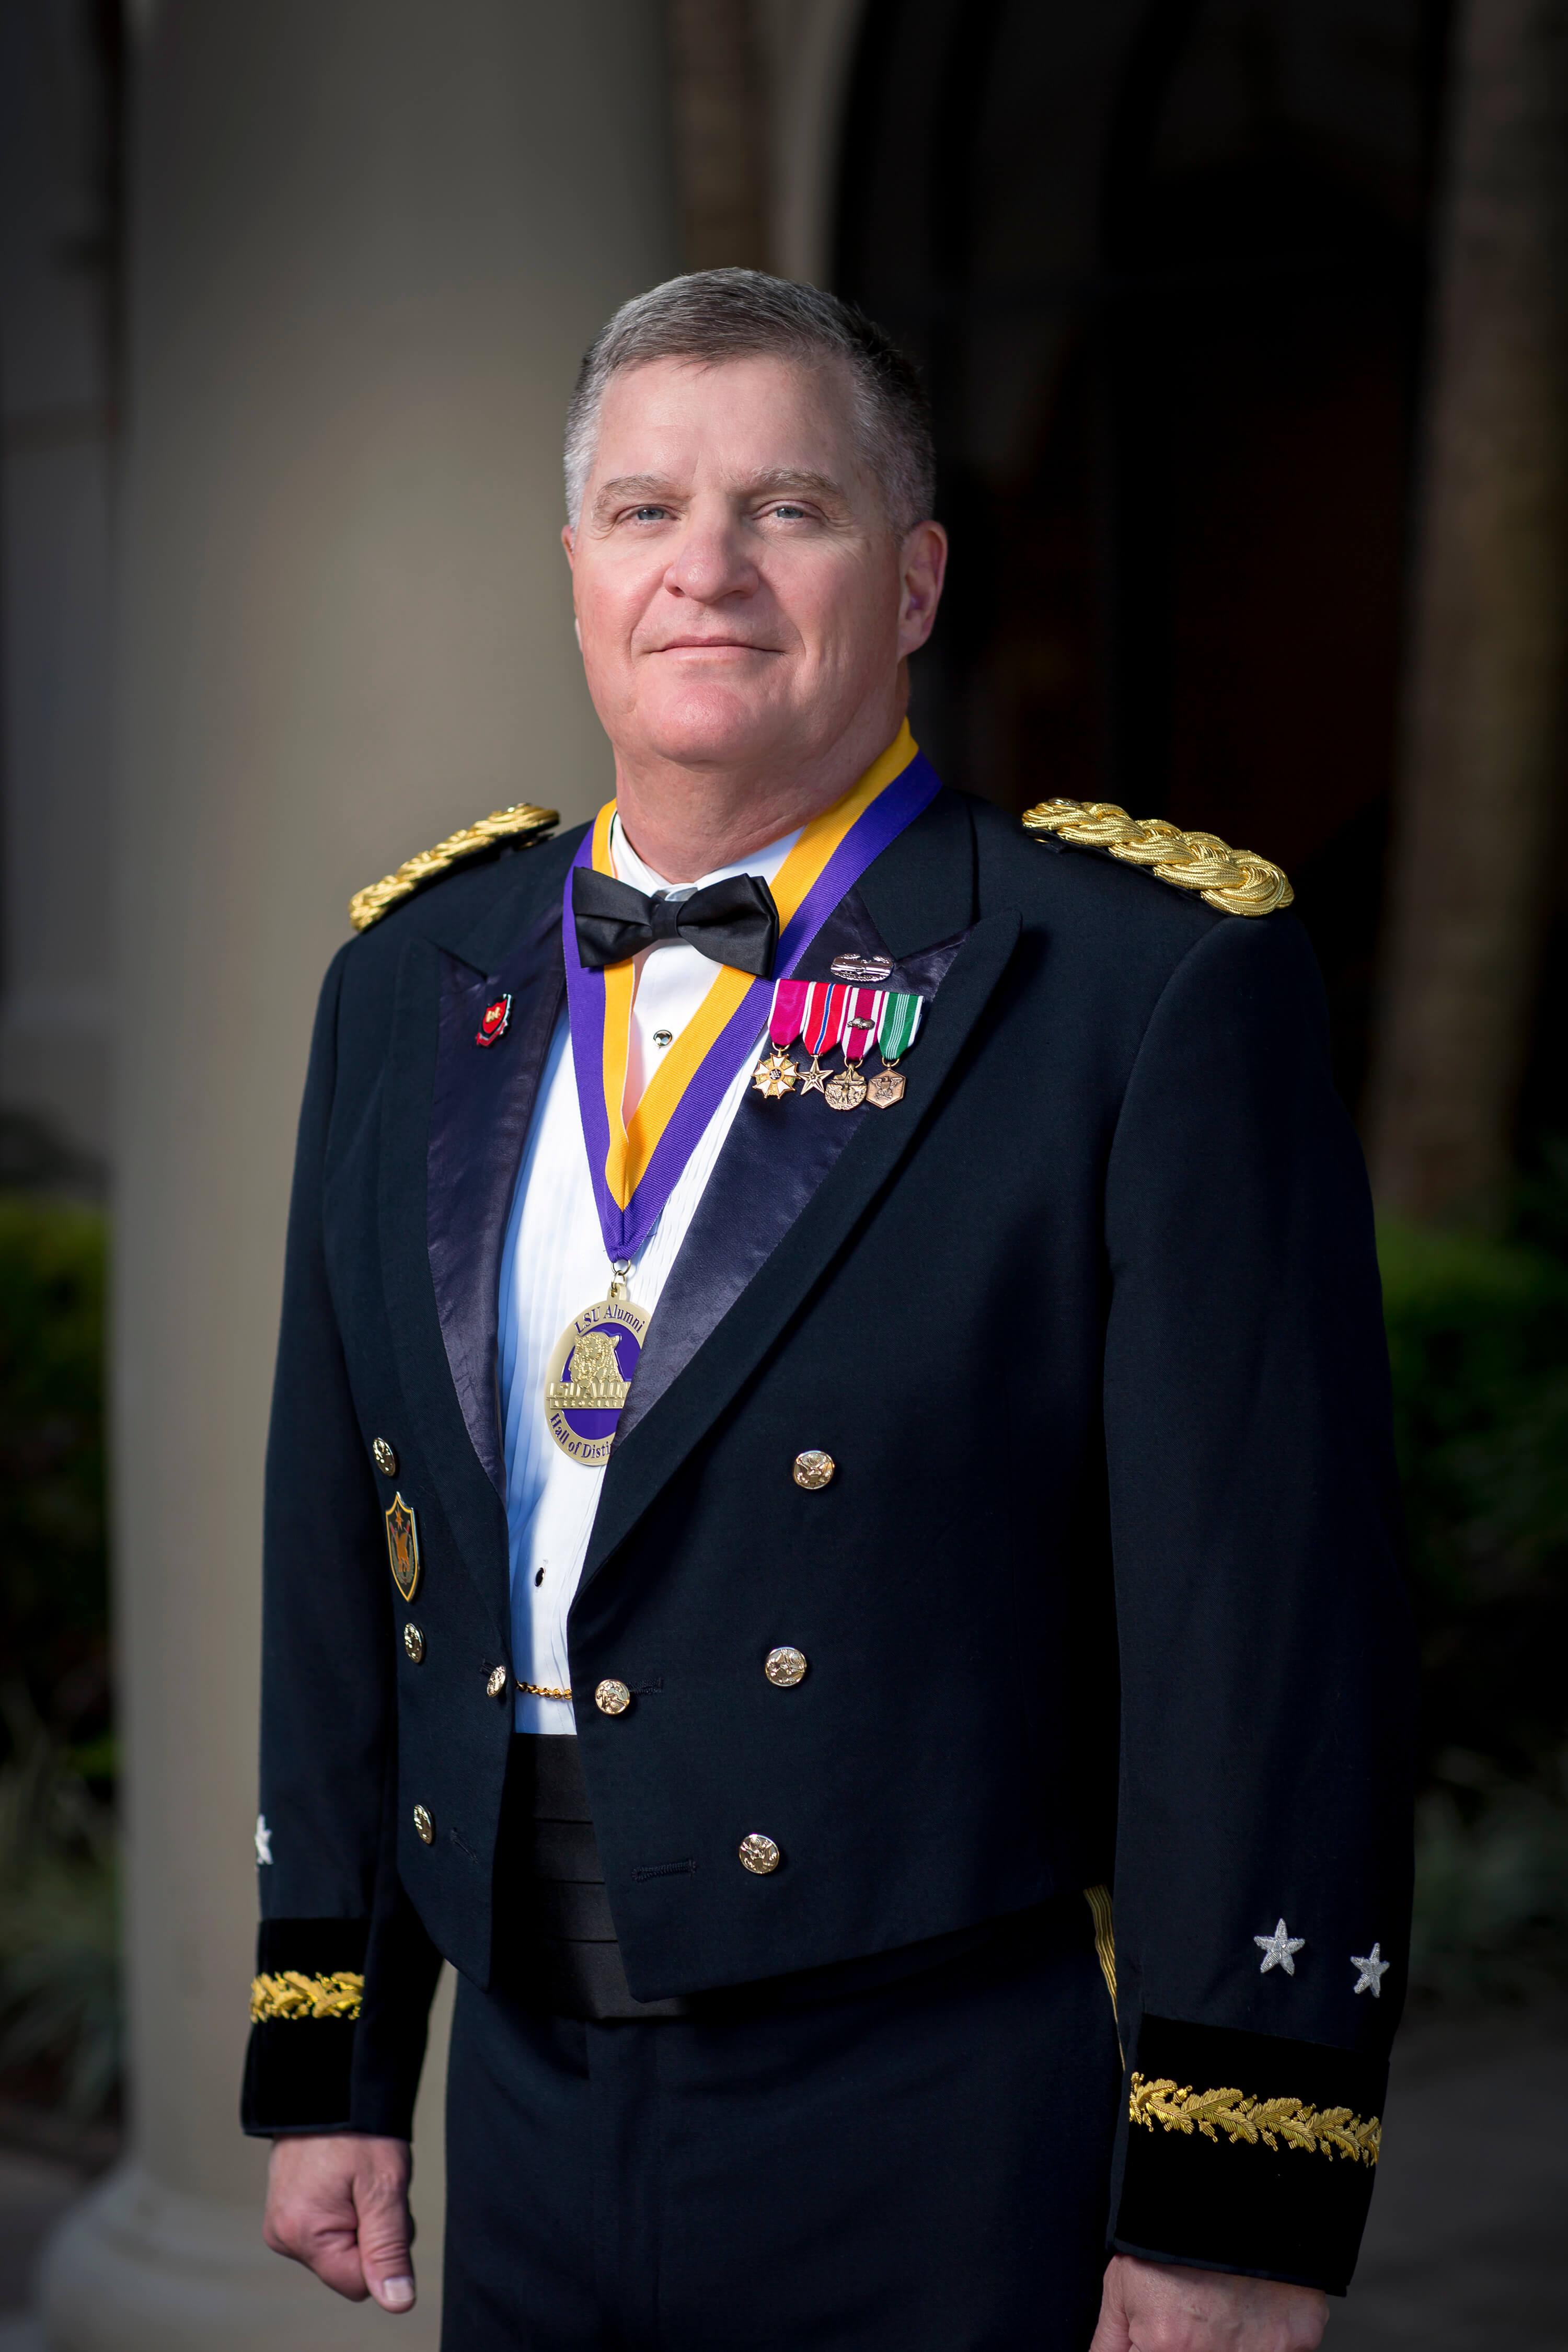 LSU0594 Major General Glenn Curtis - Hall of Distinction 2017-1.jpg